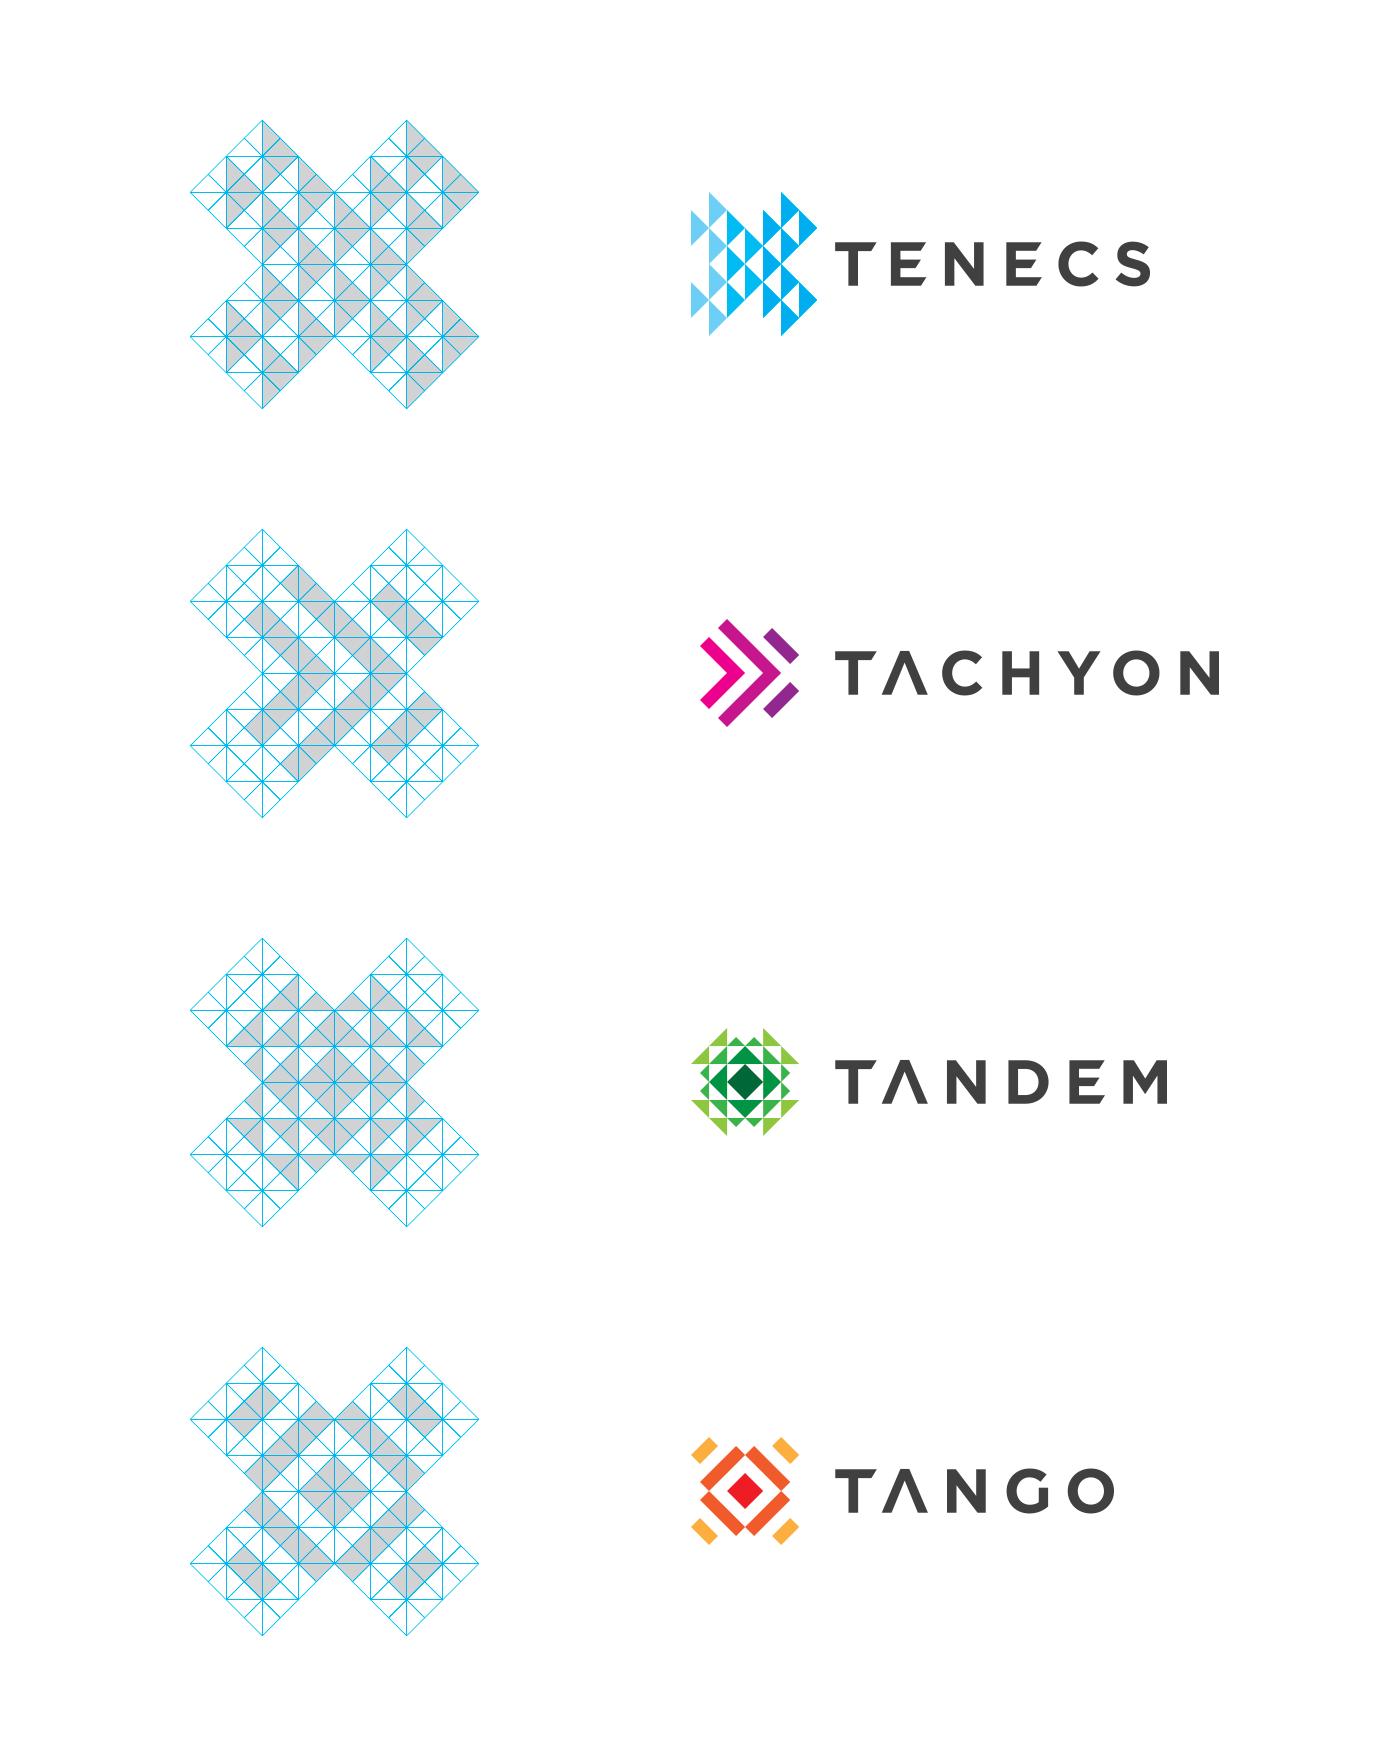 Tenecs_logos.png